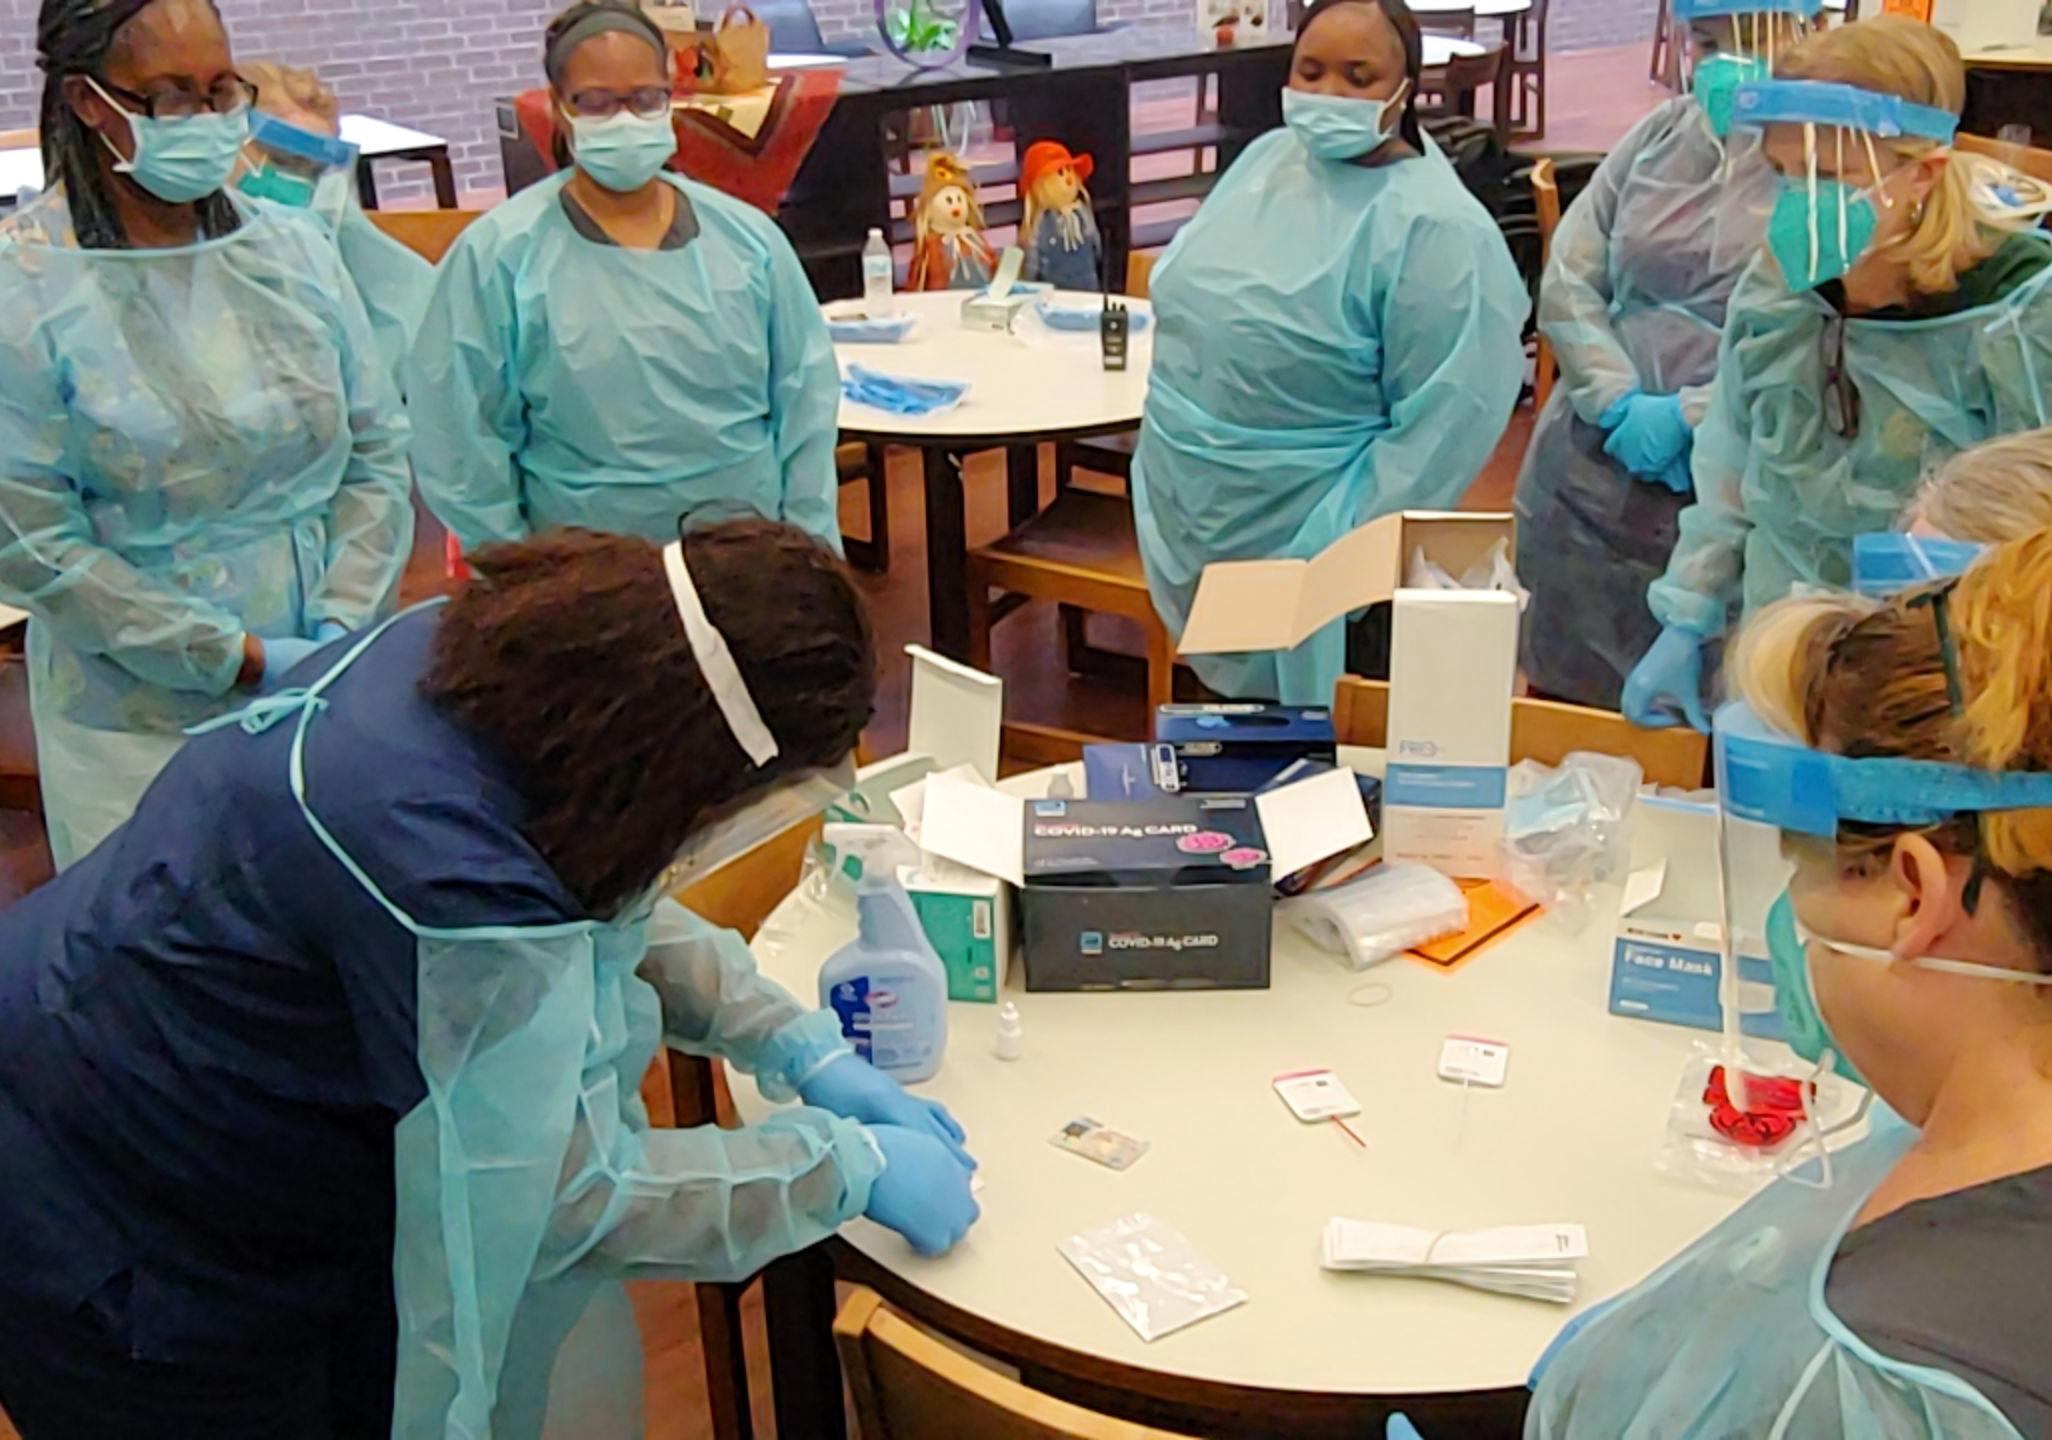 10202020-LISD-nurses-training-COVID-testing-2